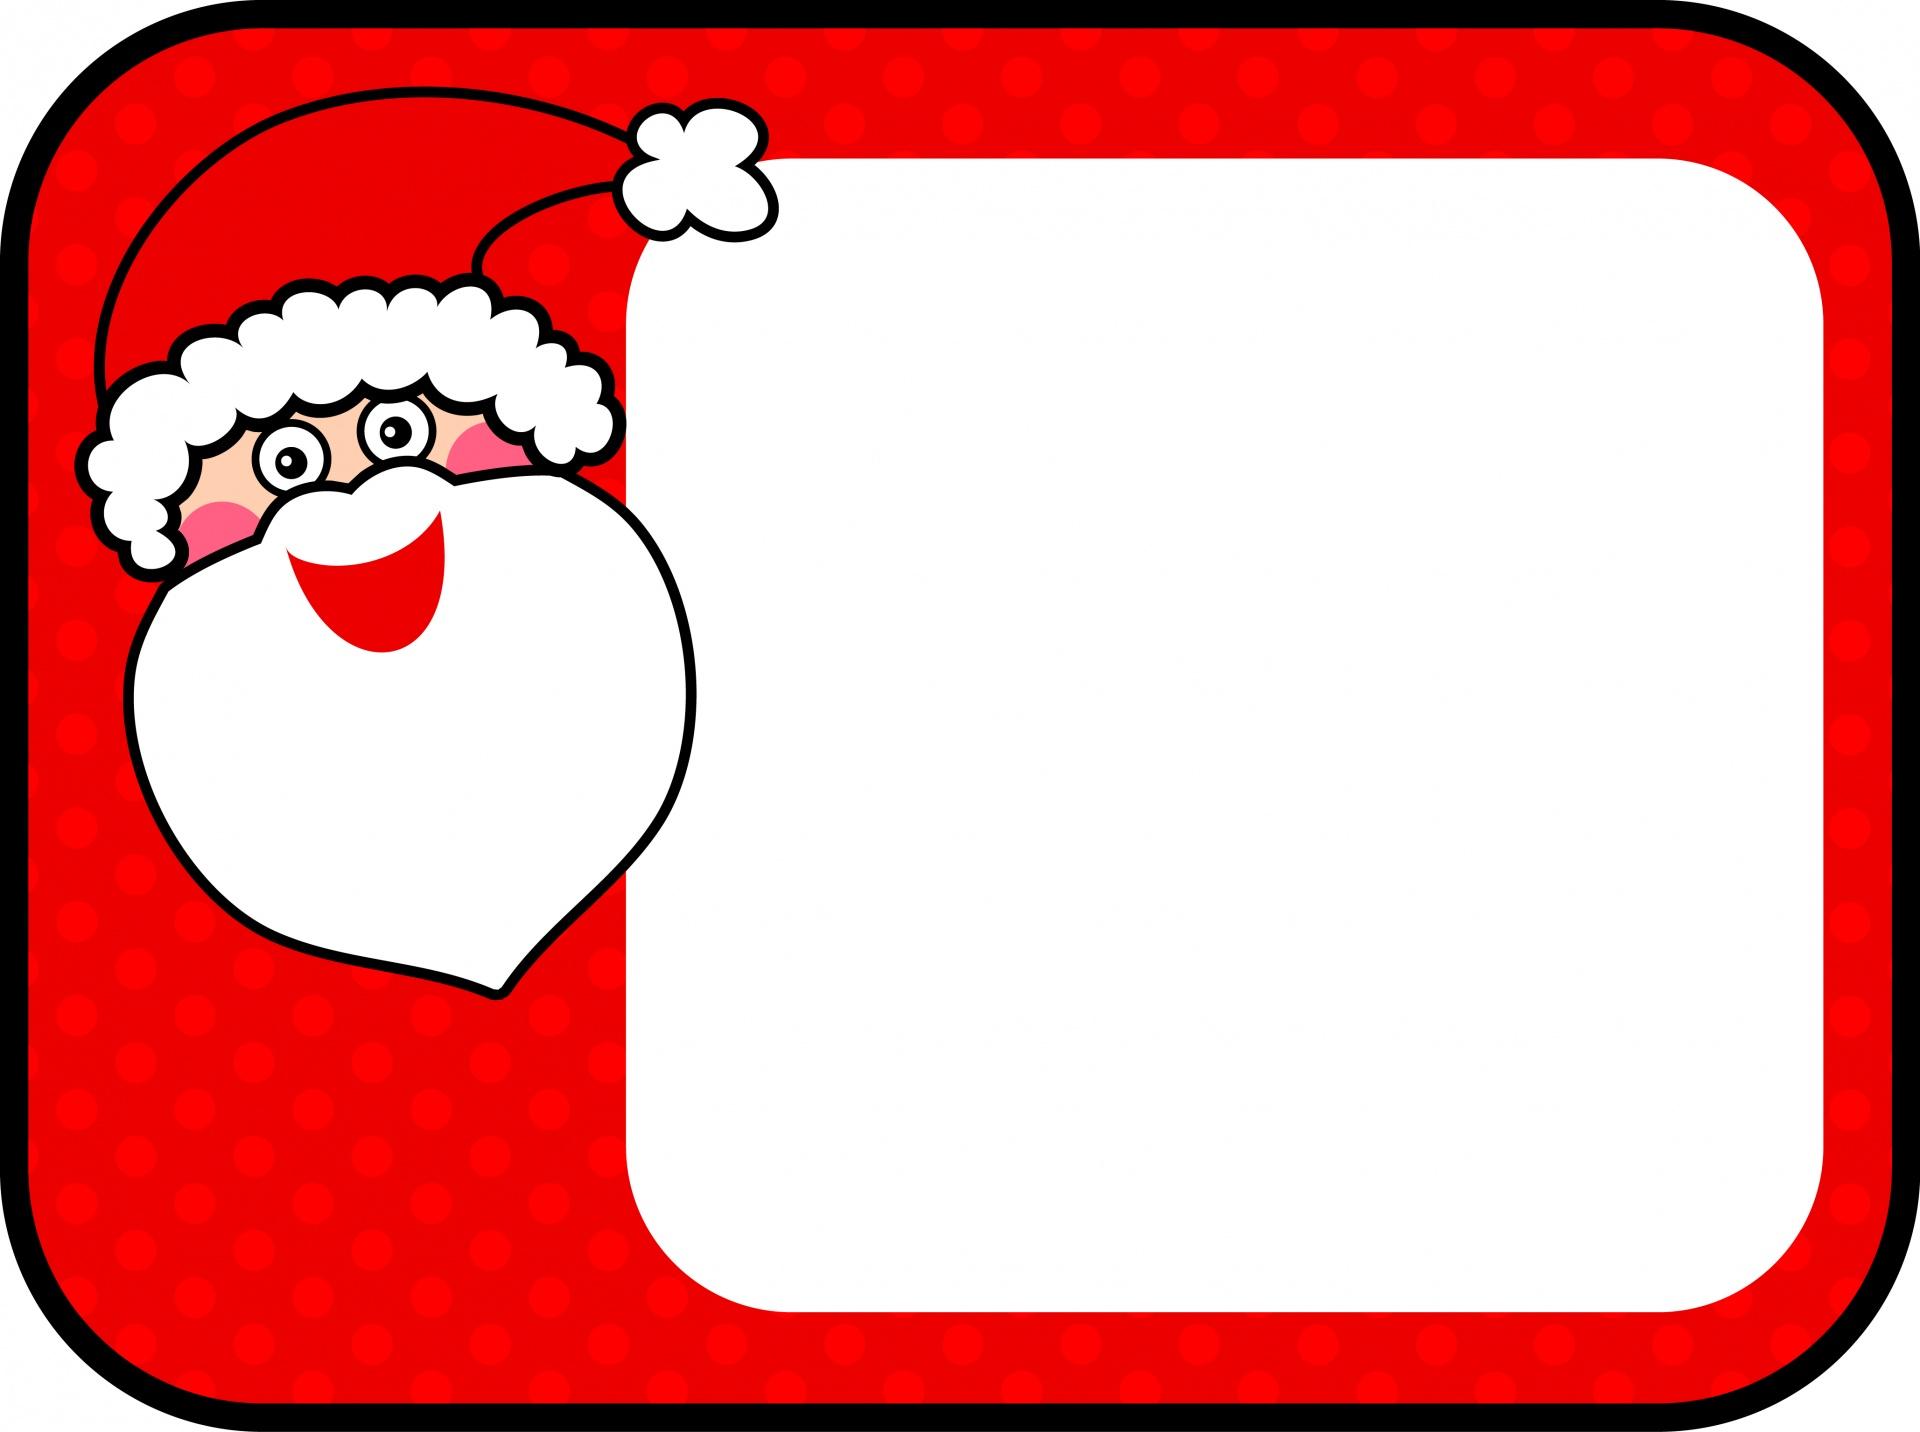 Clipart,clip art,illustration,graphic,santa.